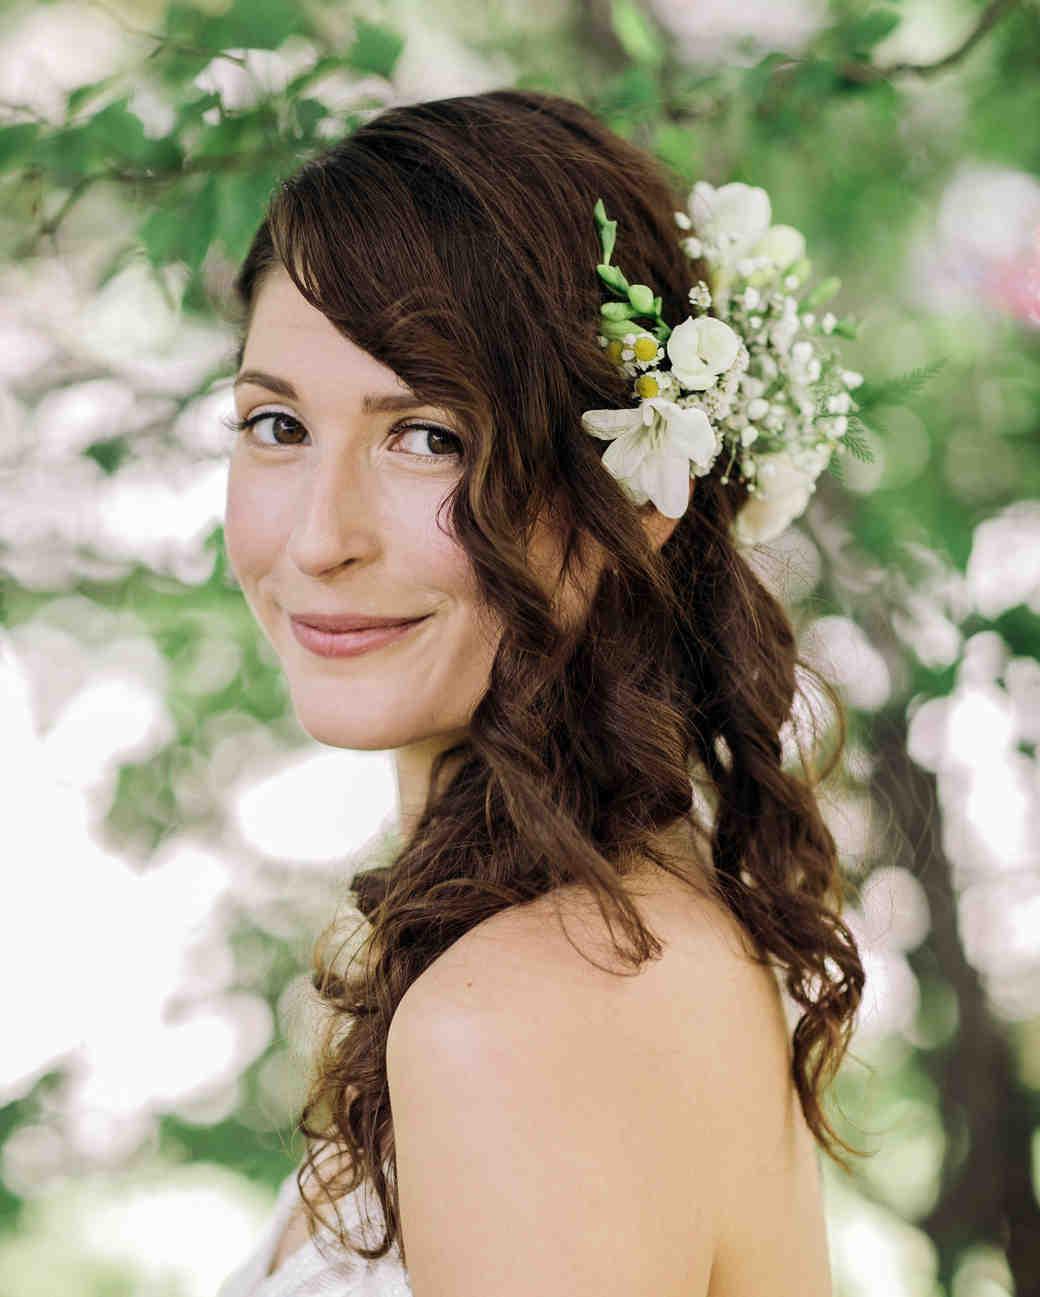 Astounding 14 Pinterest Worthy Wedding Hairstyles For Curly Hair Martha Hairstyles For Men Maxibearus